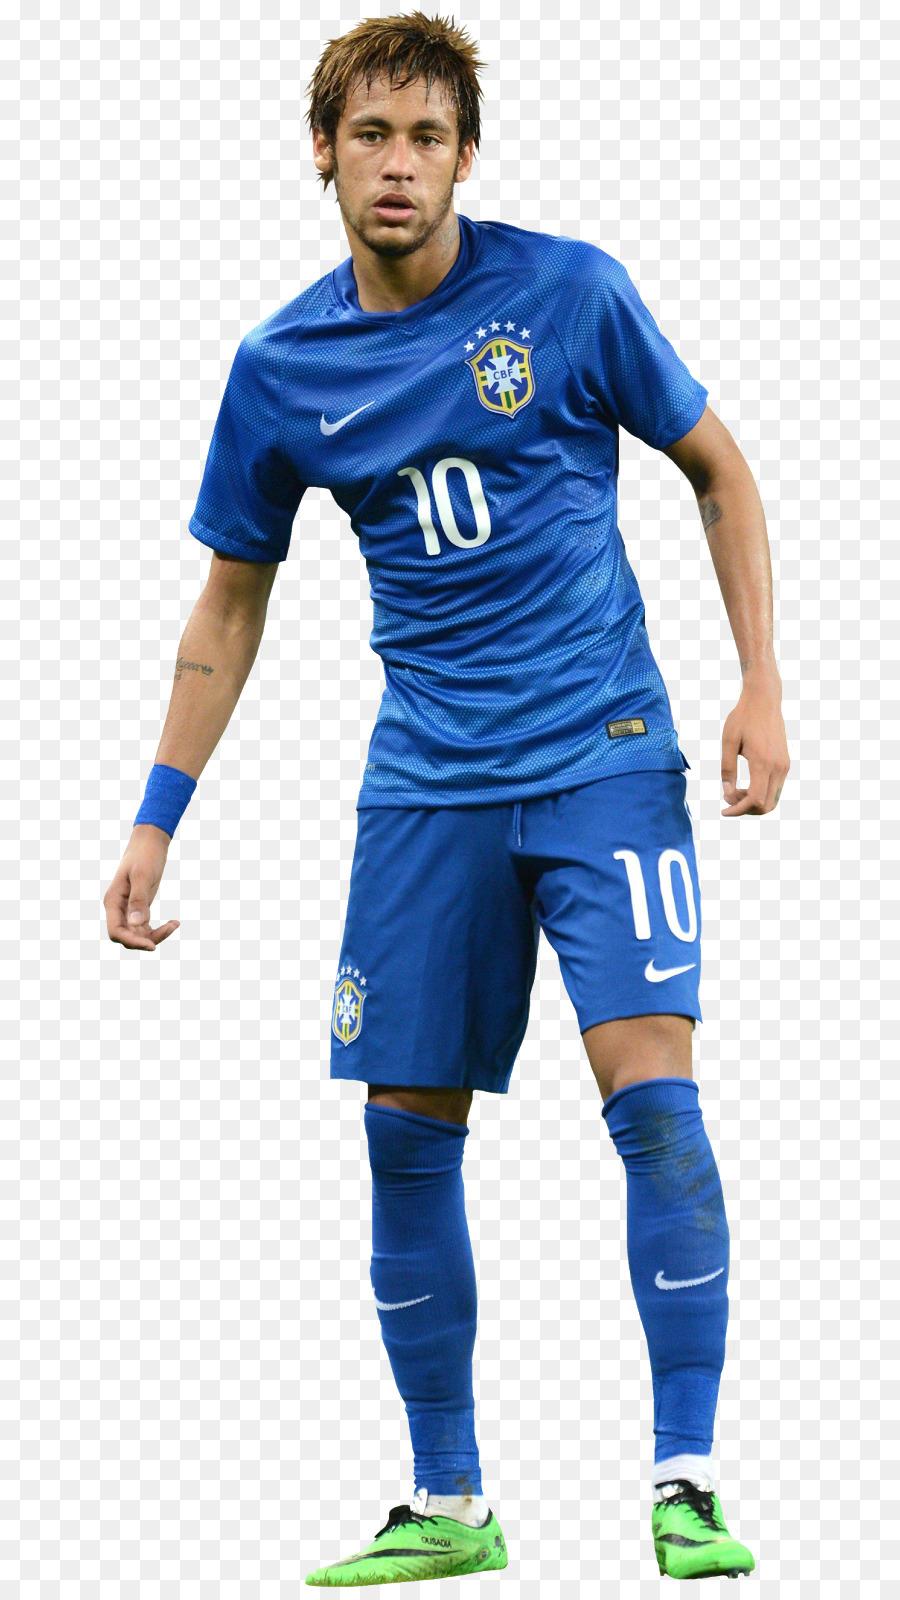 cristiano ronaldo blaues trikot